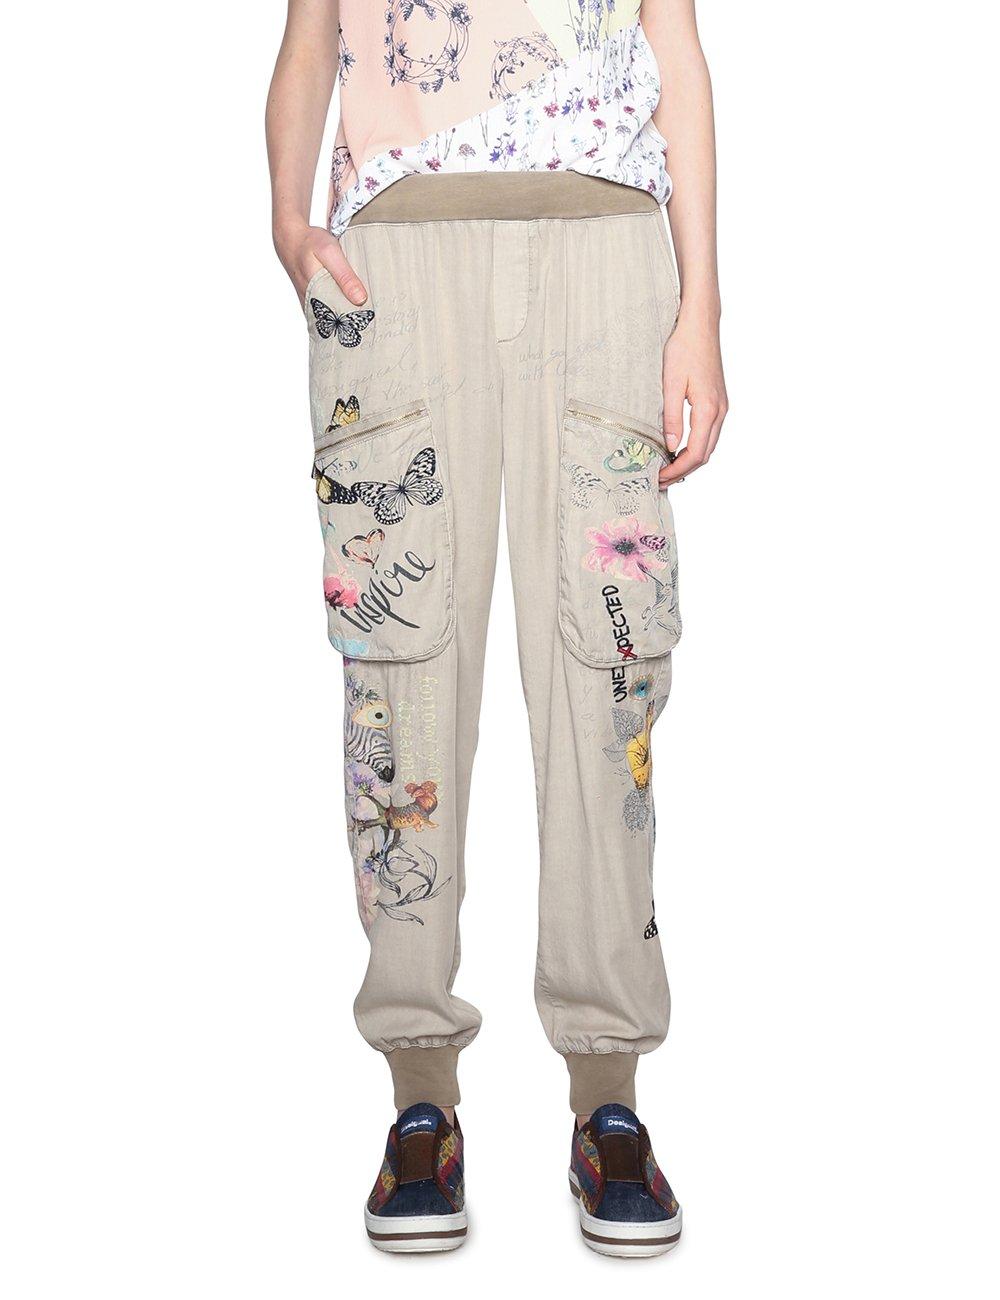 Ofertas Desigual Pant Eddy Pantalones Para Mujer Moda Ofertastop